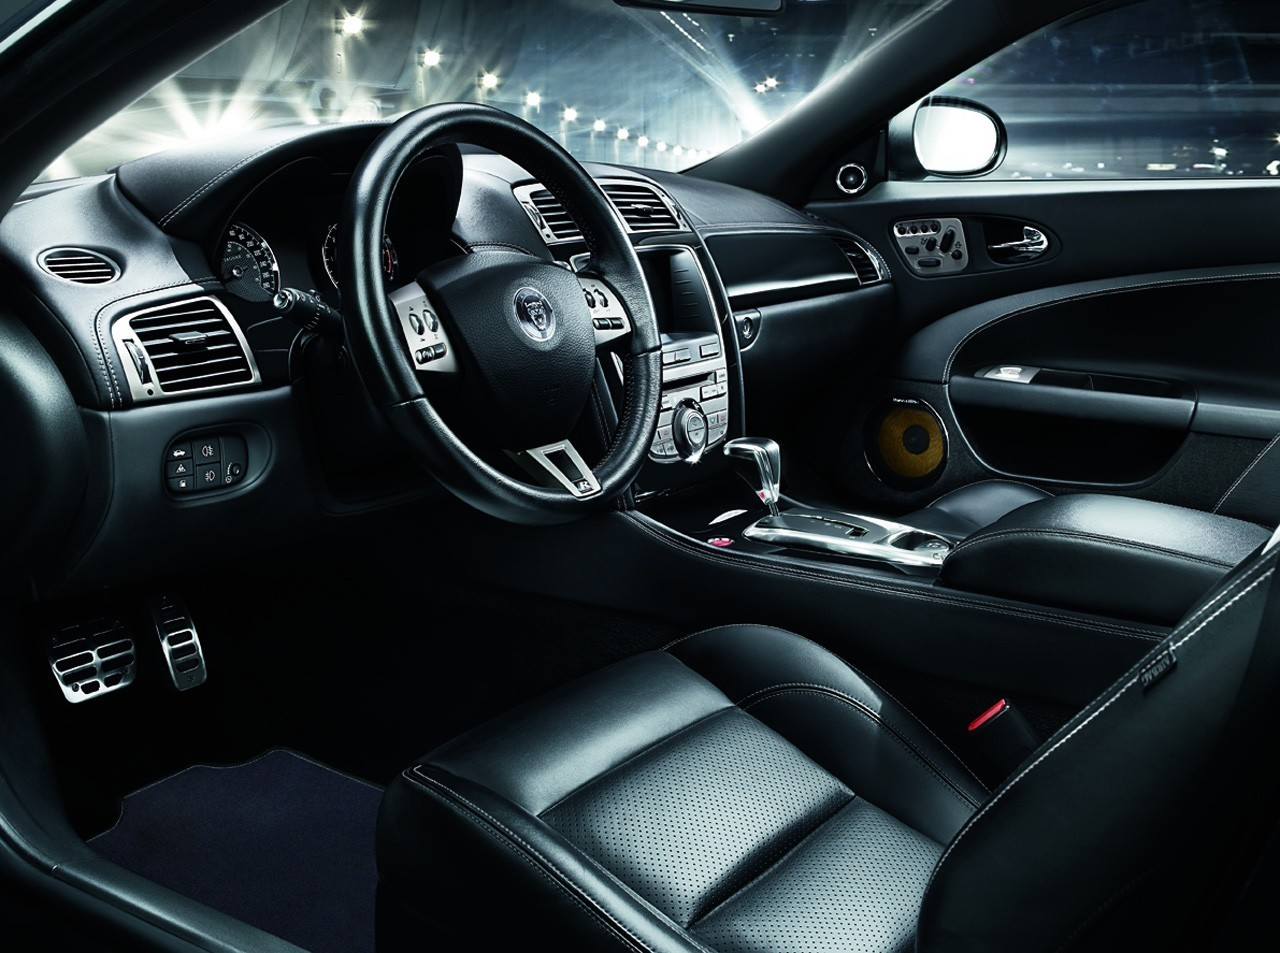 Cool Cars Jaguar Xj220 Interior